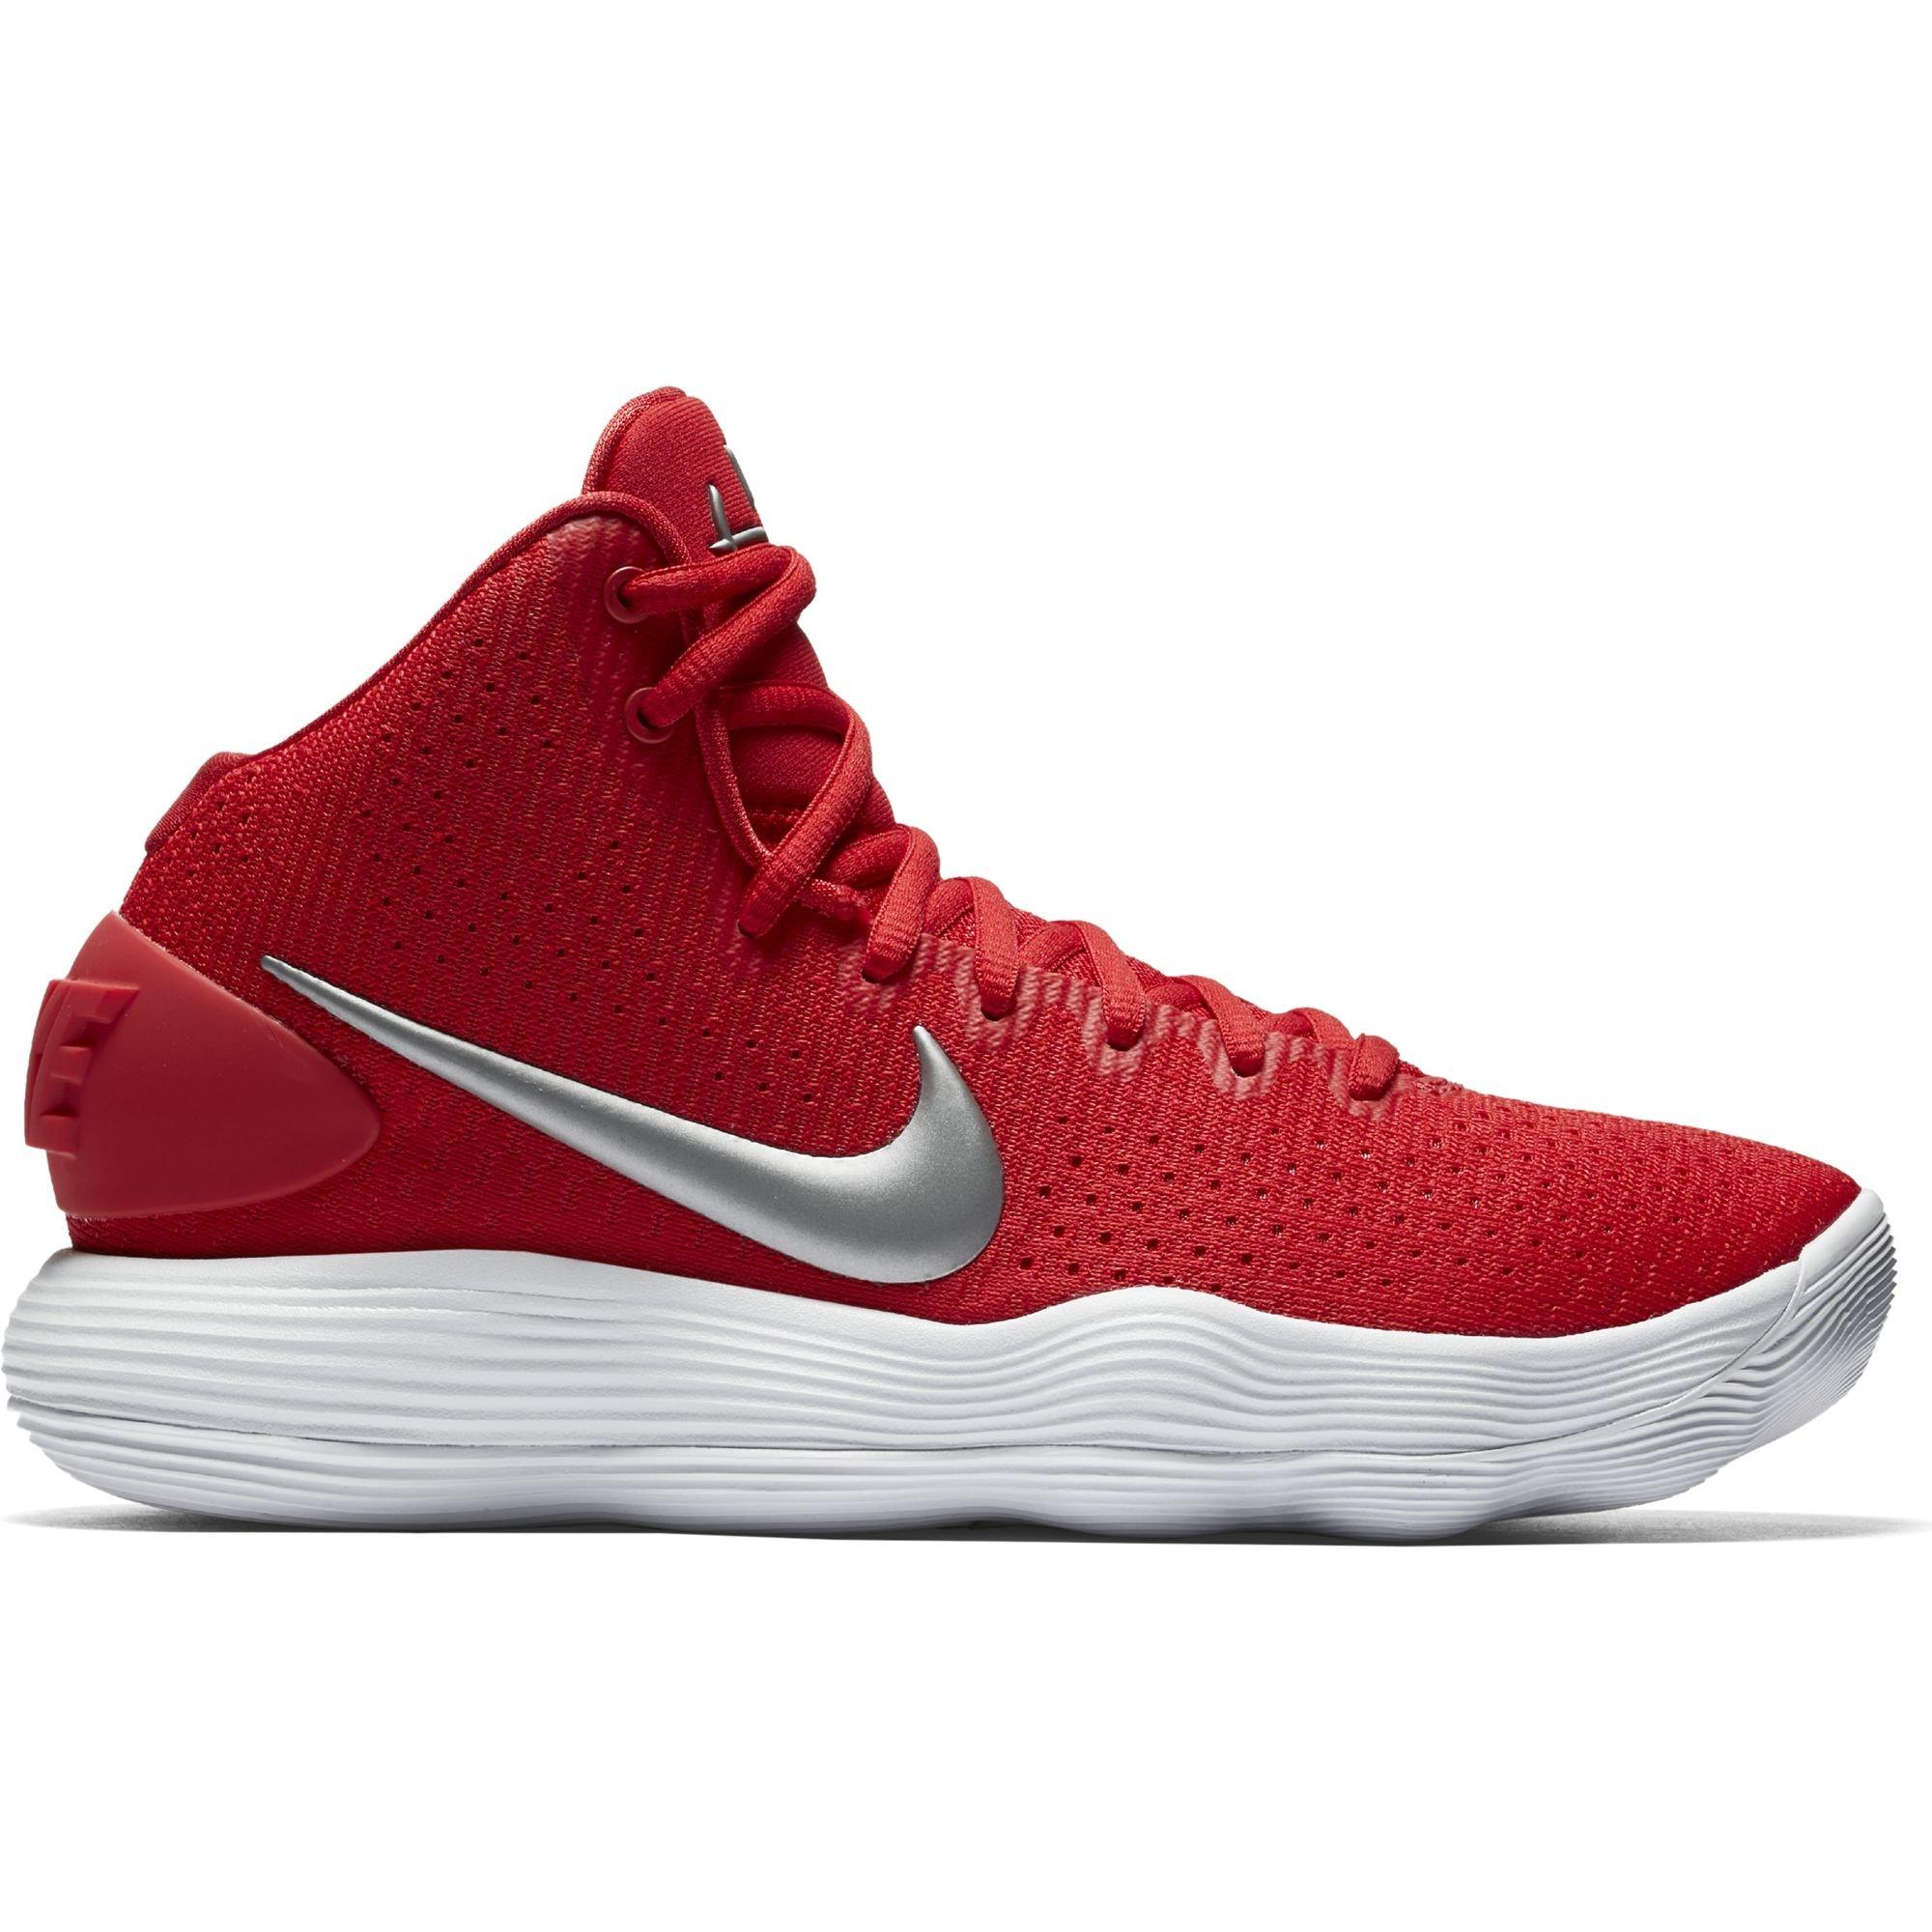 Nike Womens Hyperdunk 2017 TB Basketball Shoe University Red/Metallic Silver/White Size 9 US